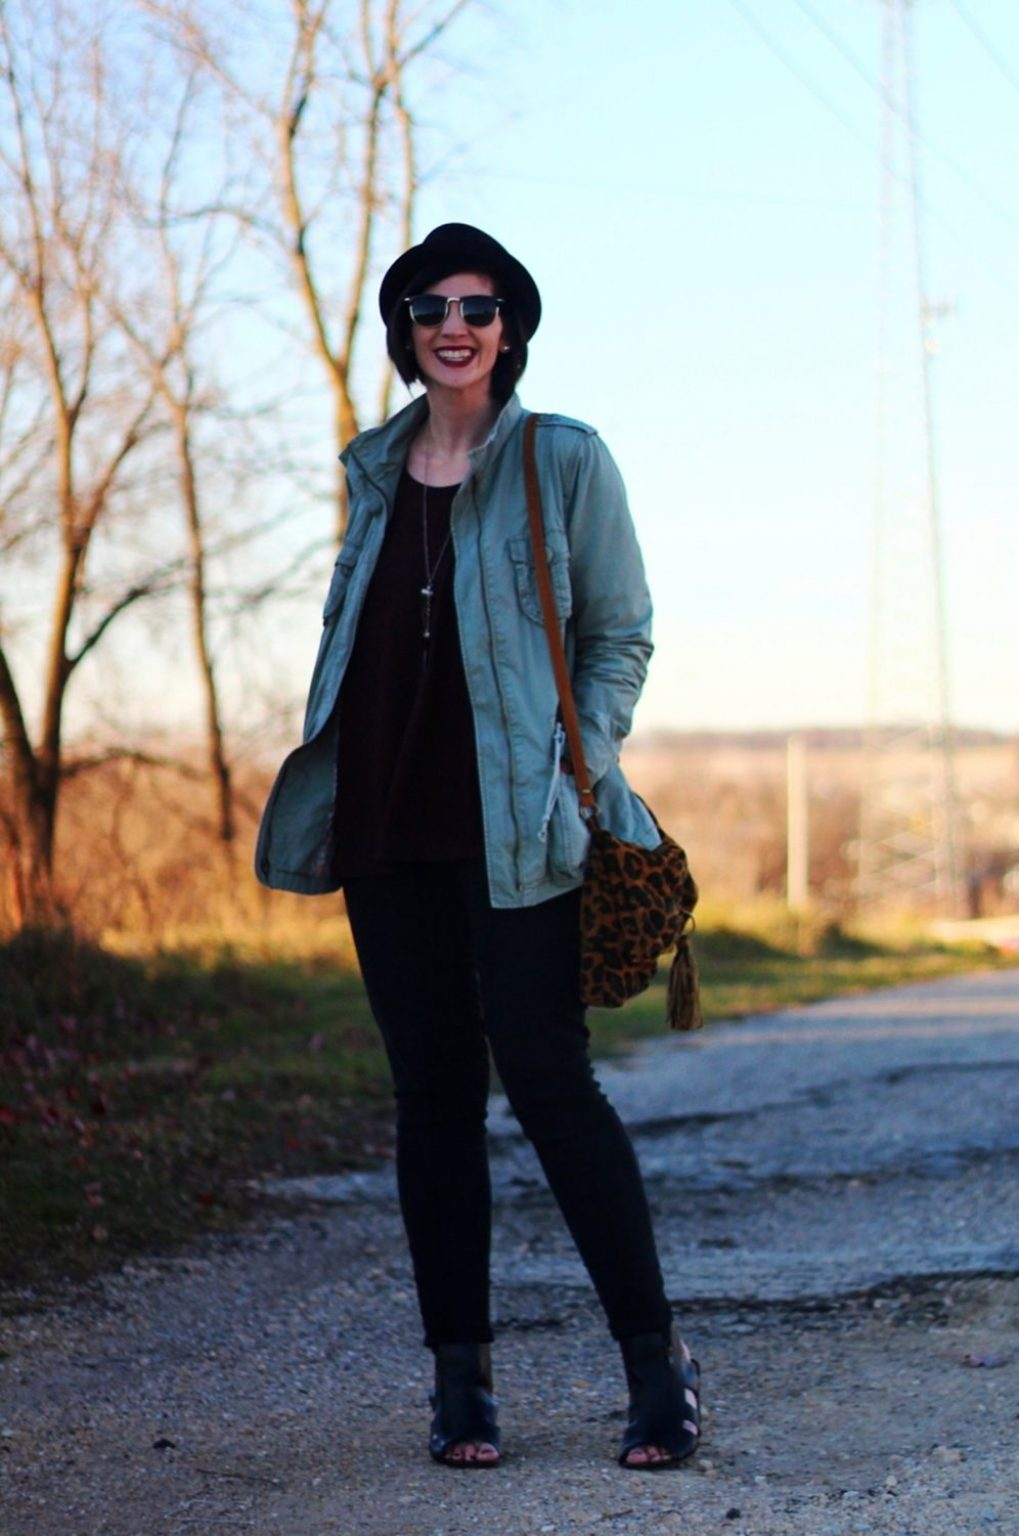 Outfit: burgundy top, burgundy lipstick, olive colored jacket, black sunglasses, pork pie hat, black jeans, Seven Dials Shoes, leopard print cross body purse